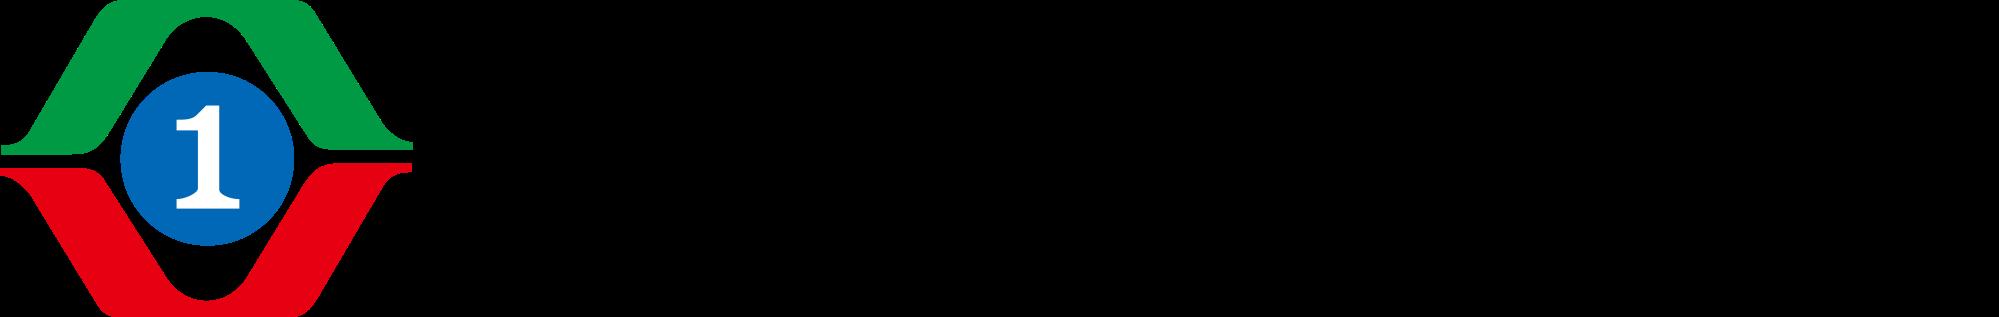 Tōkai Television Broadcasting